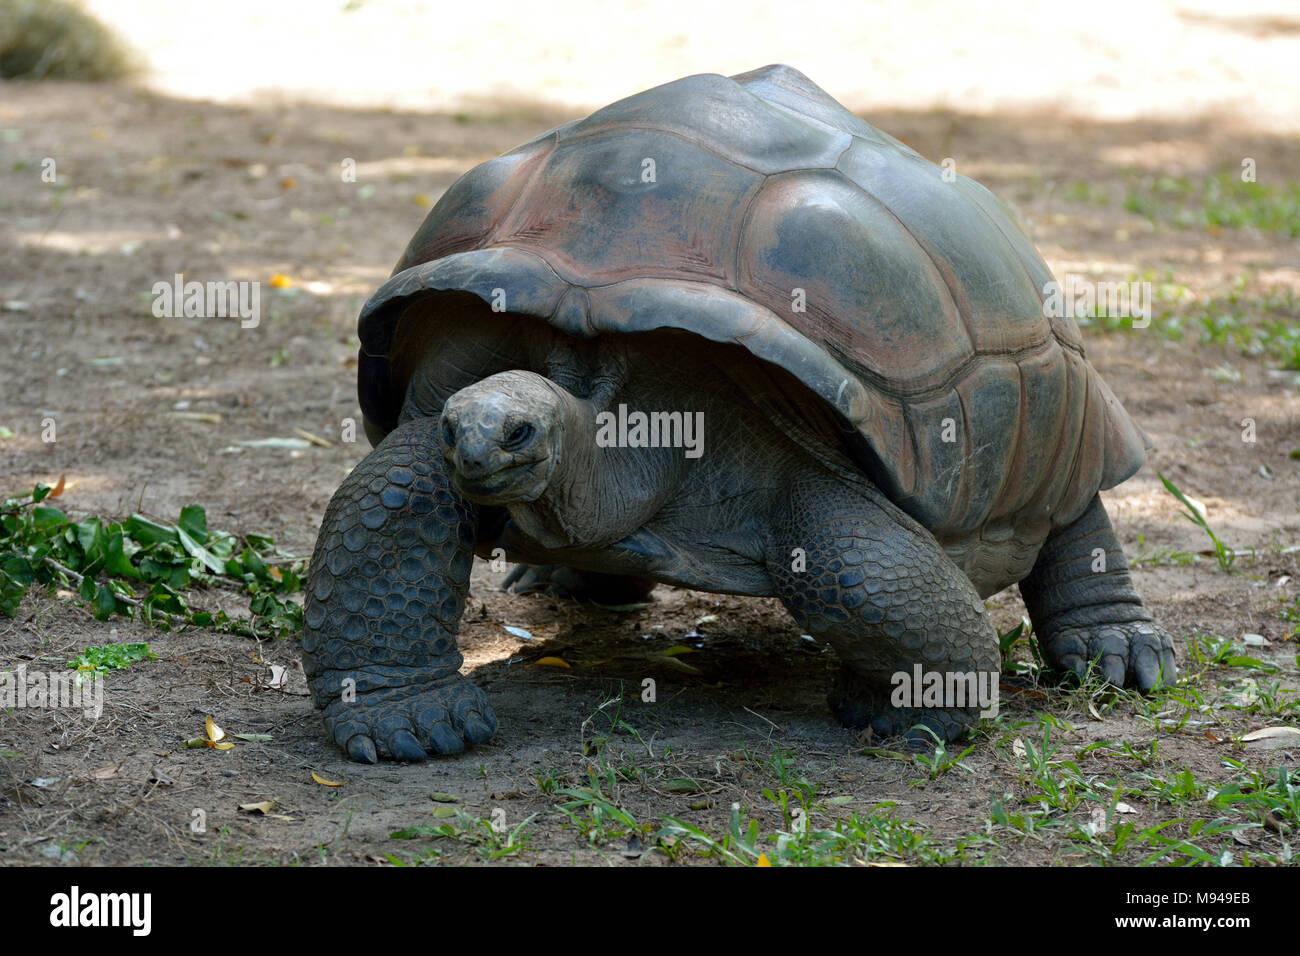 Galapagos giant tortoise (Chelonoidis nigra) are the largest living species of tortoise. - Stock Image